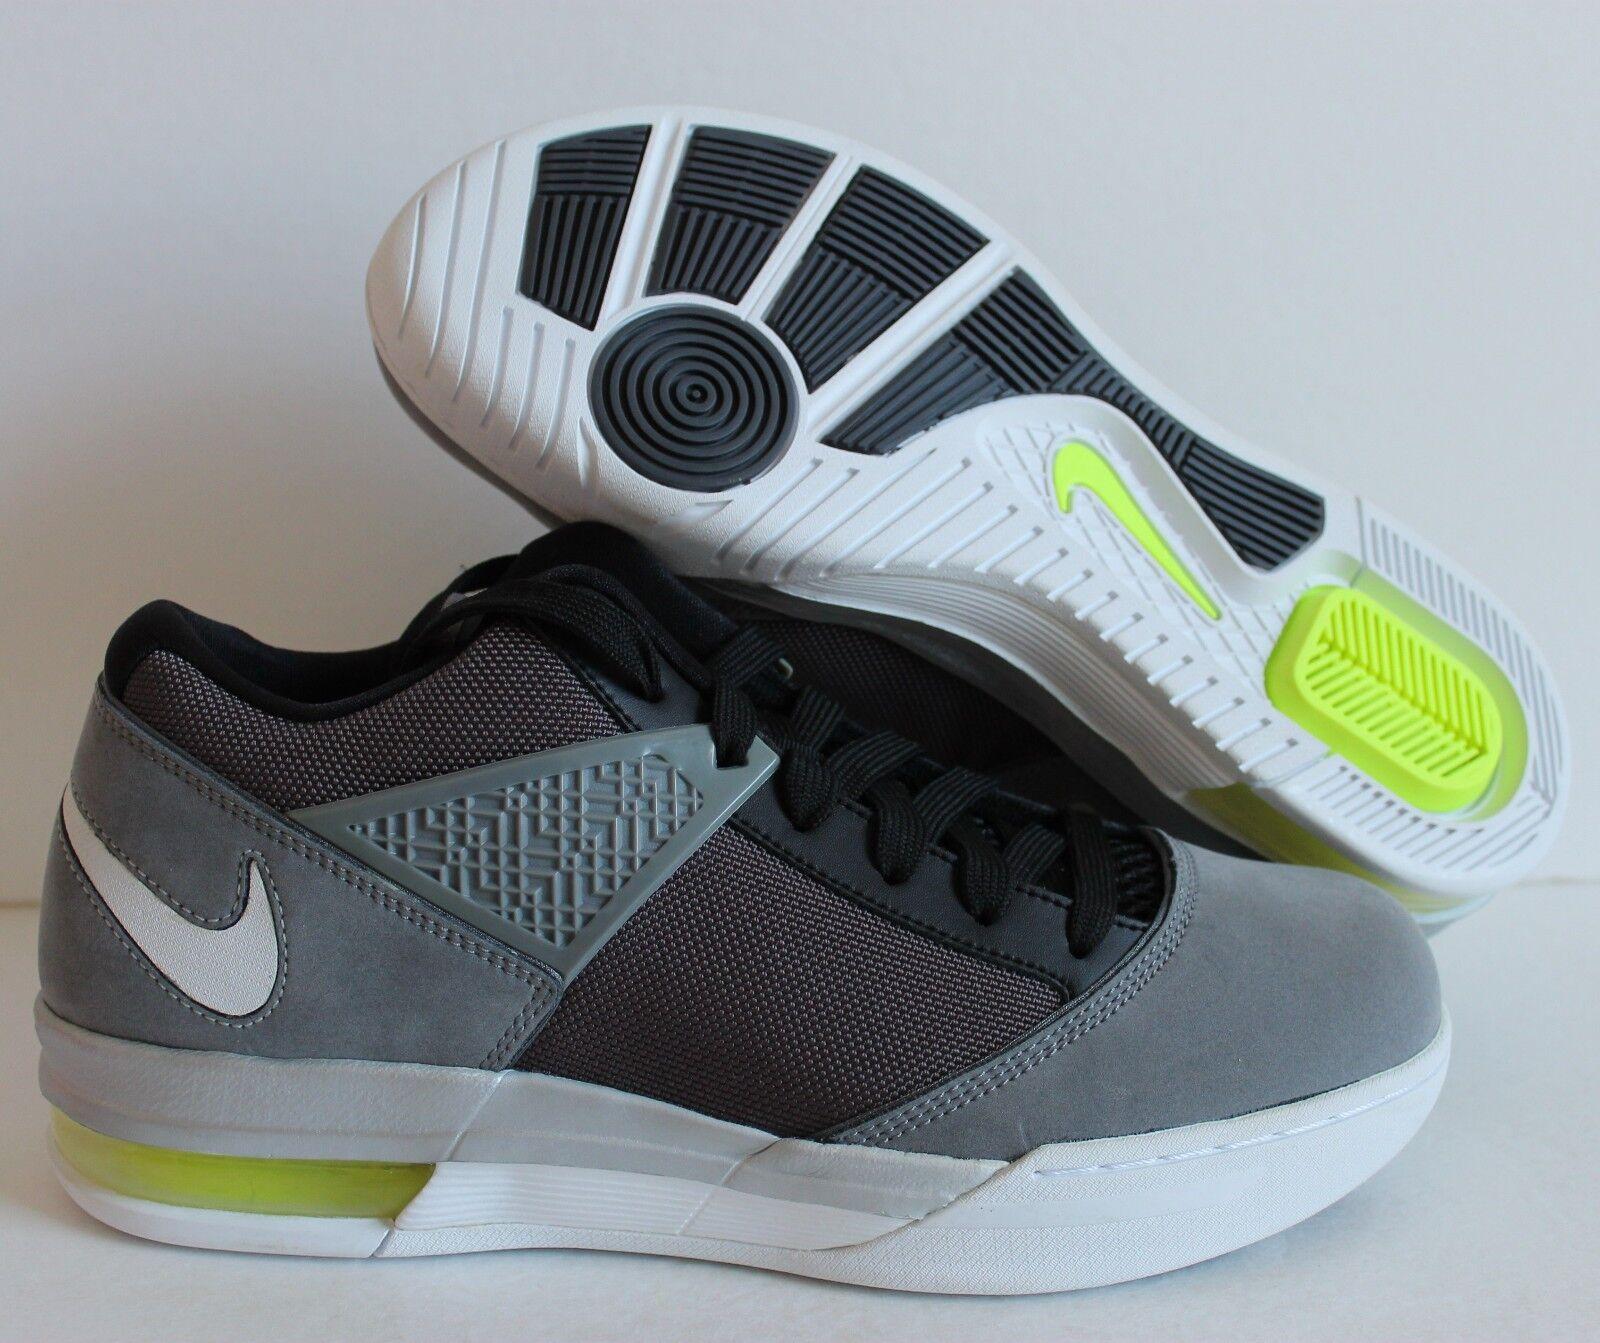 Nike zoom lbj lebron james ambasciatore iii sz 9 [415142-004]